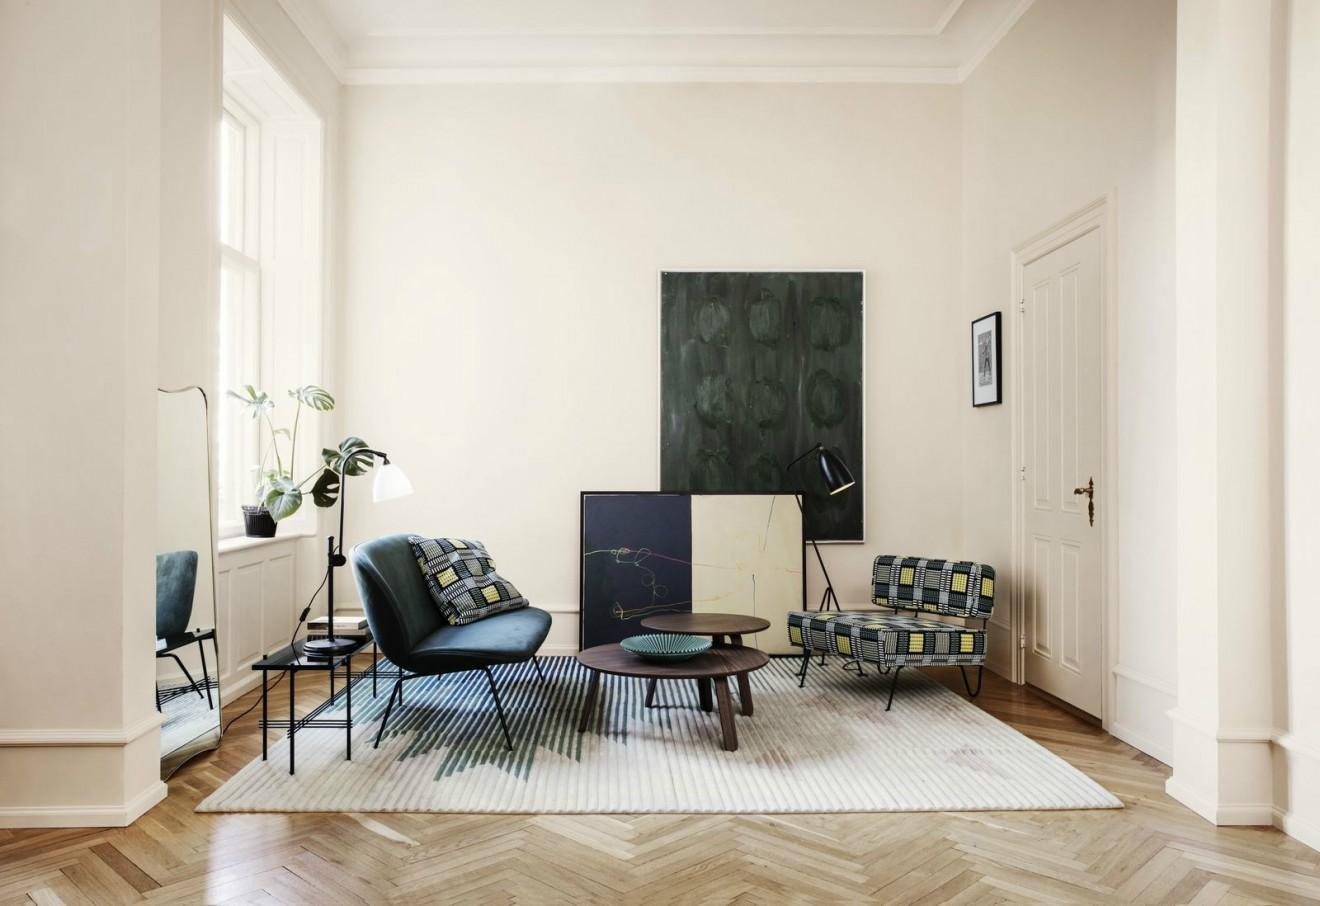 Gubi setting collection 2018 - 2019 Victors Design Agency